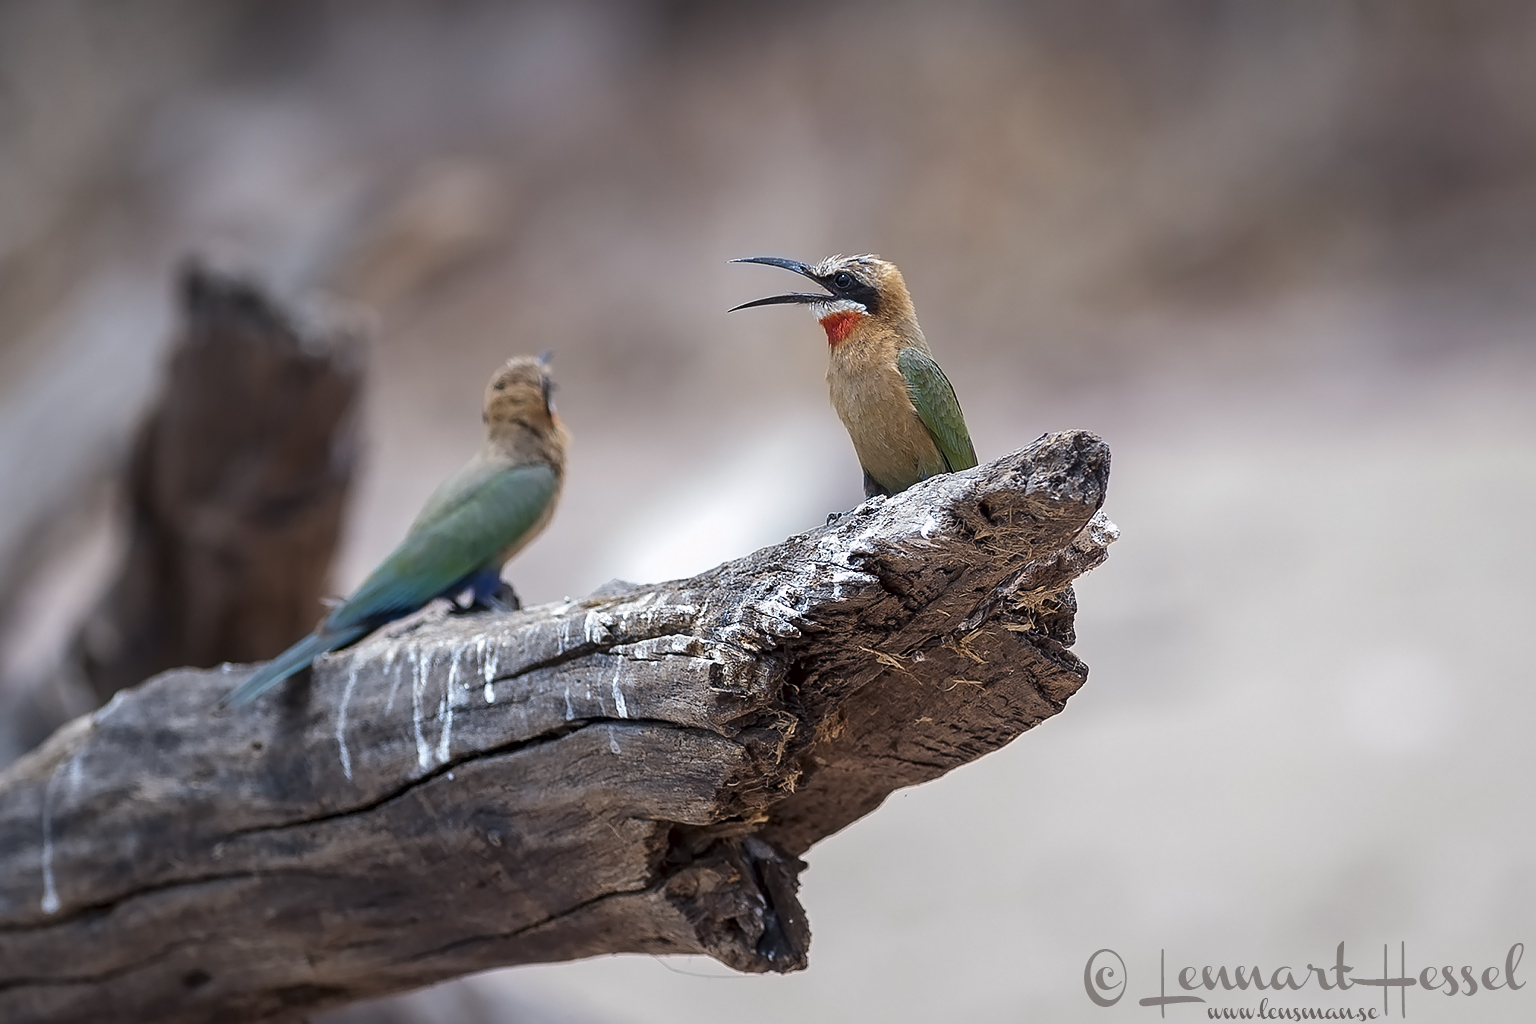 White-fronted Bee-eater at Chobe River, Botswana